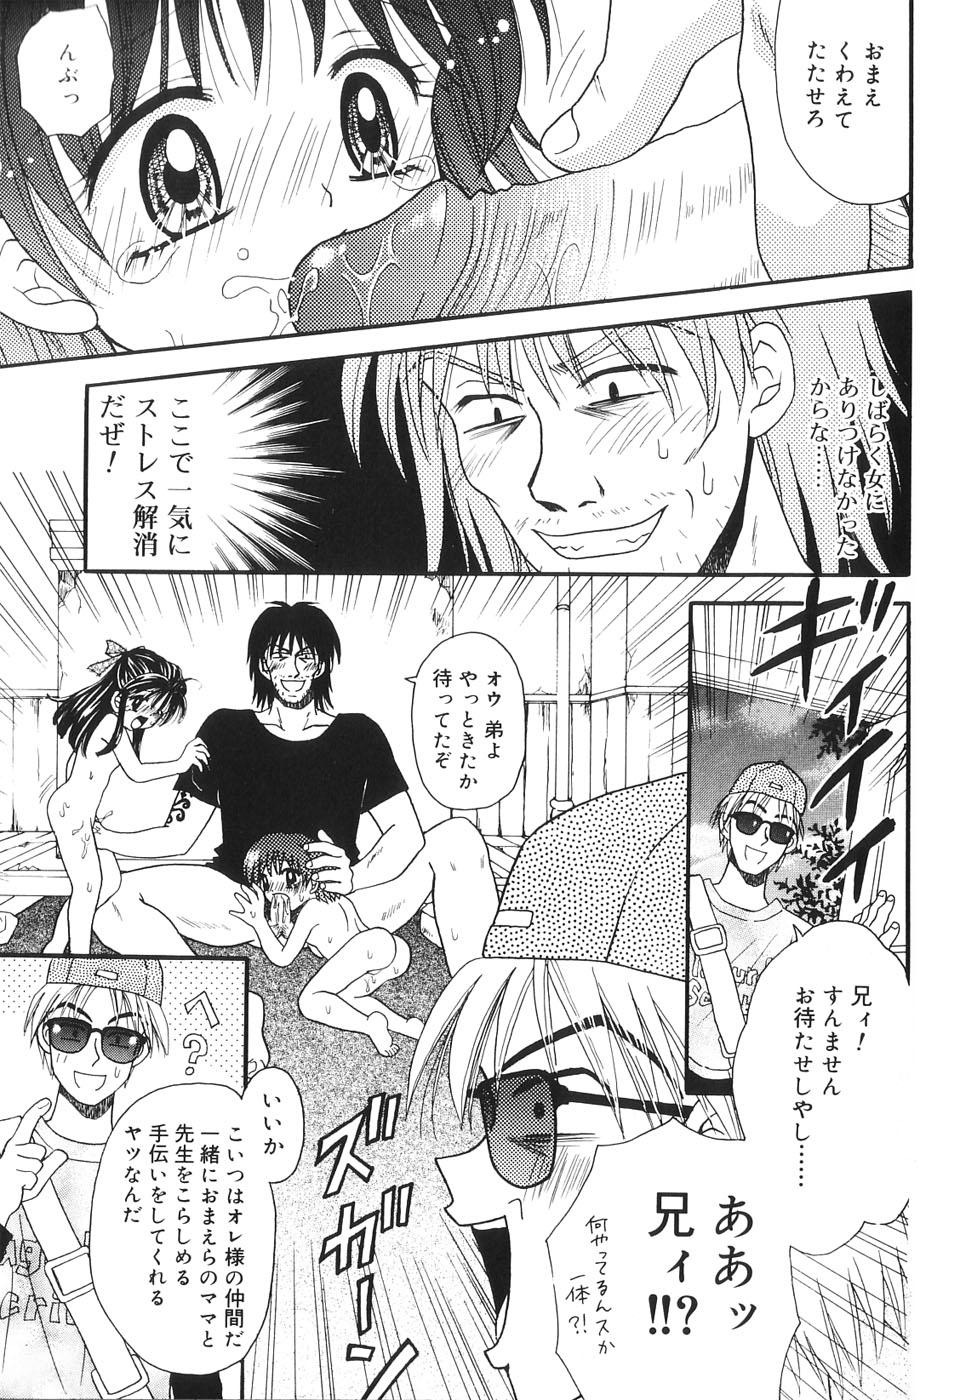 Musoubana 89